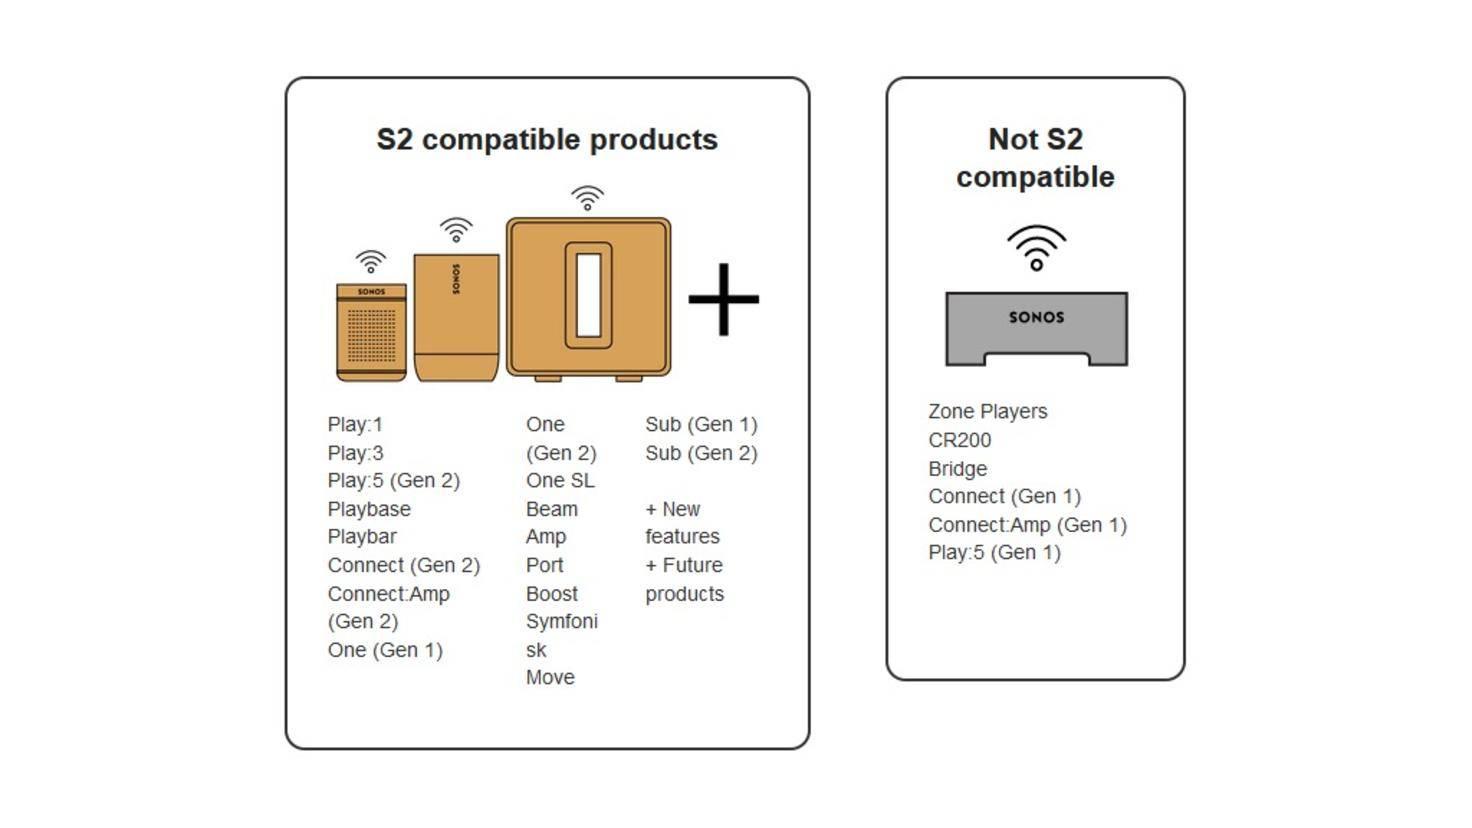 sonos-s2-kompatible-produkte